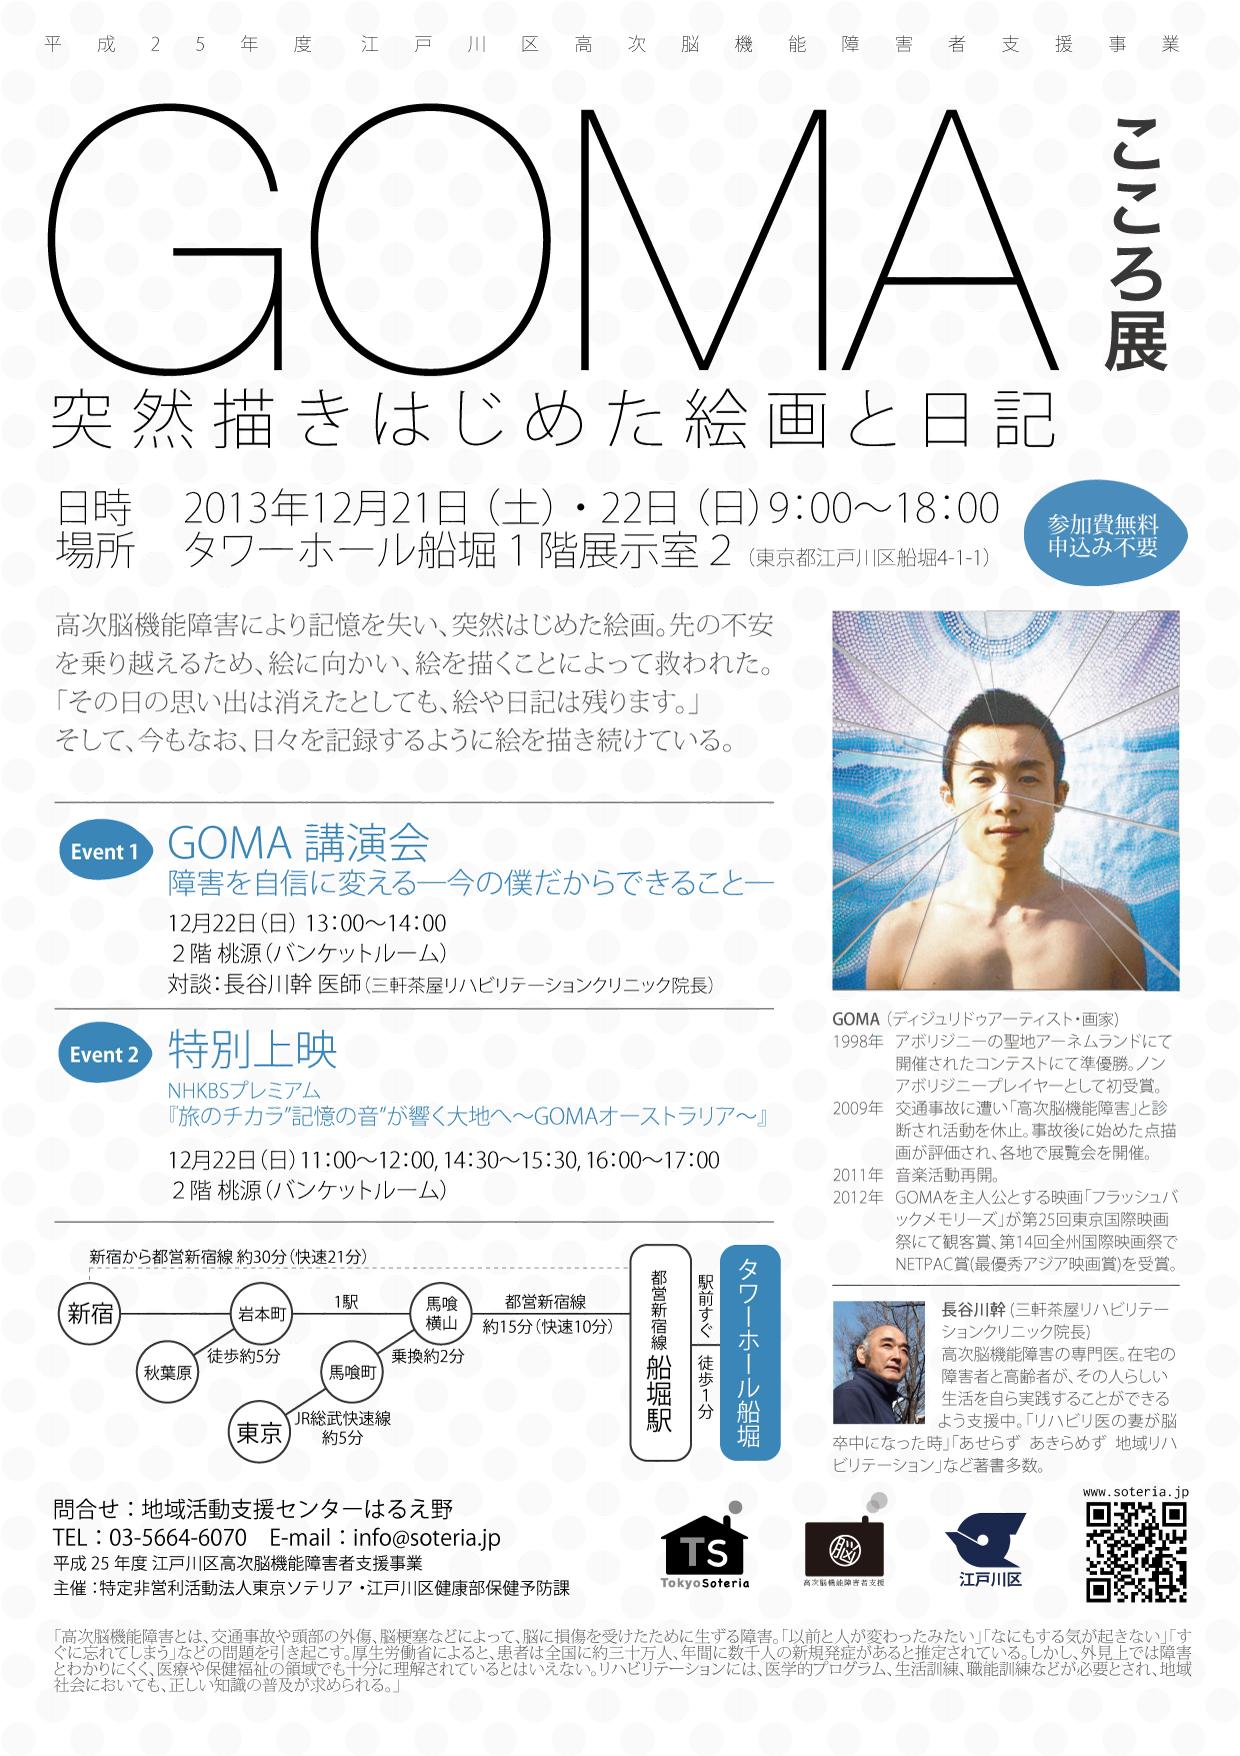 GOMA8_omote